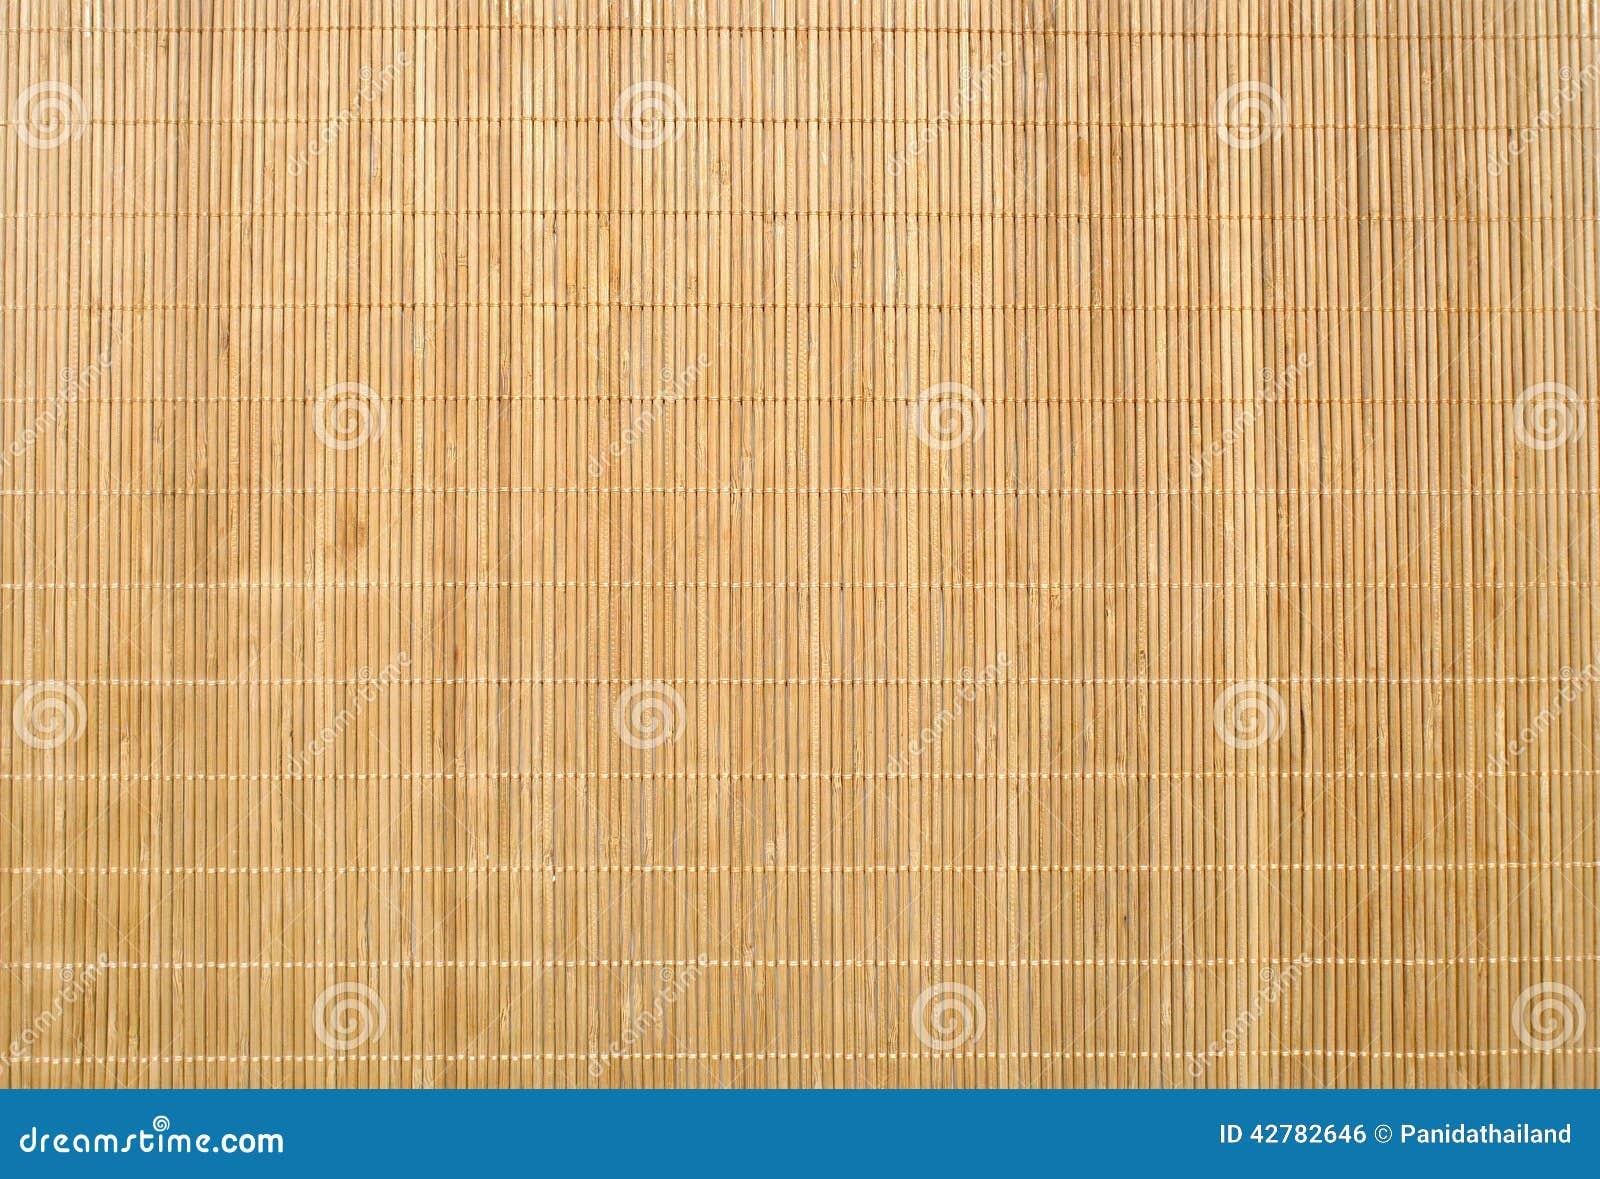 Wood Bamboo Mat Texture Background